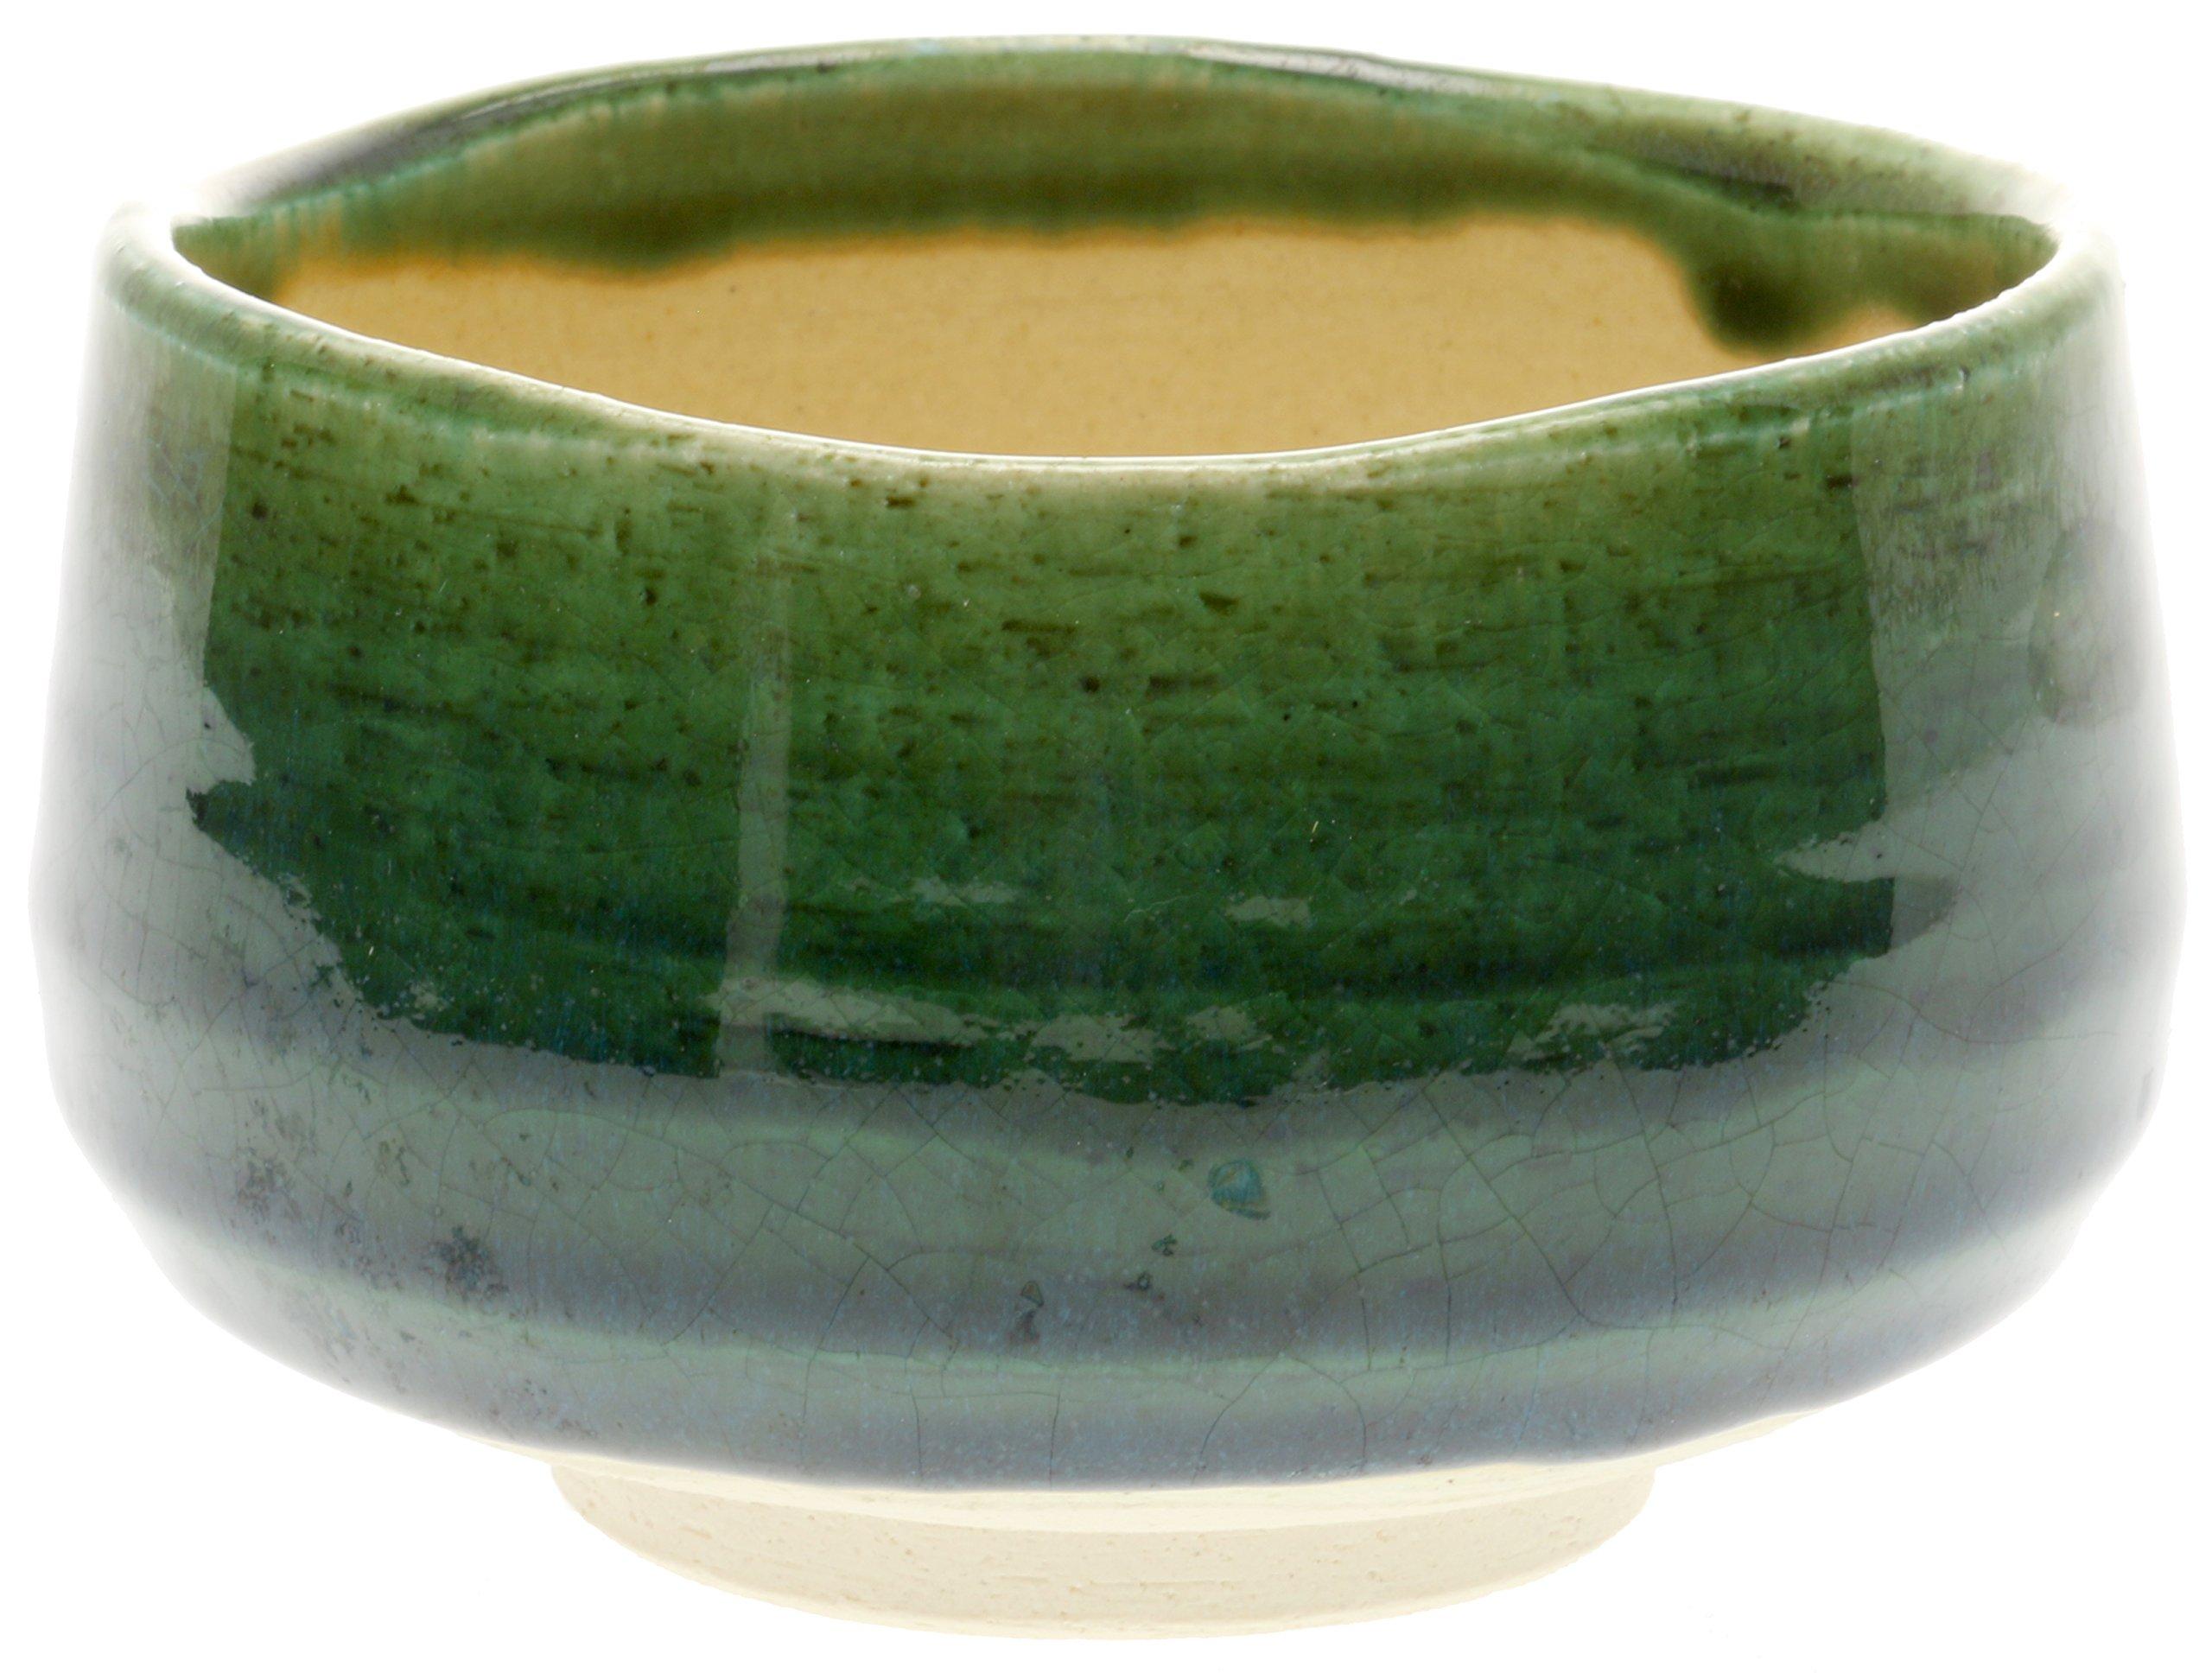 Kotobuki 114-518 Matcha Chawan, Green